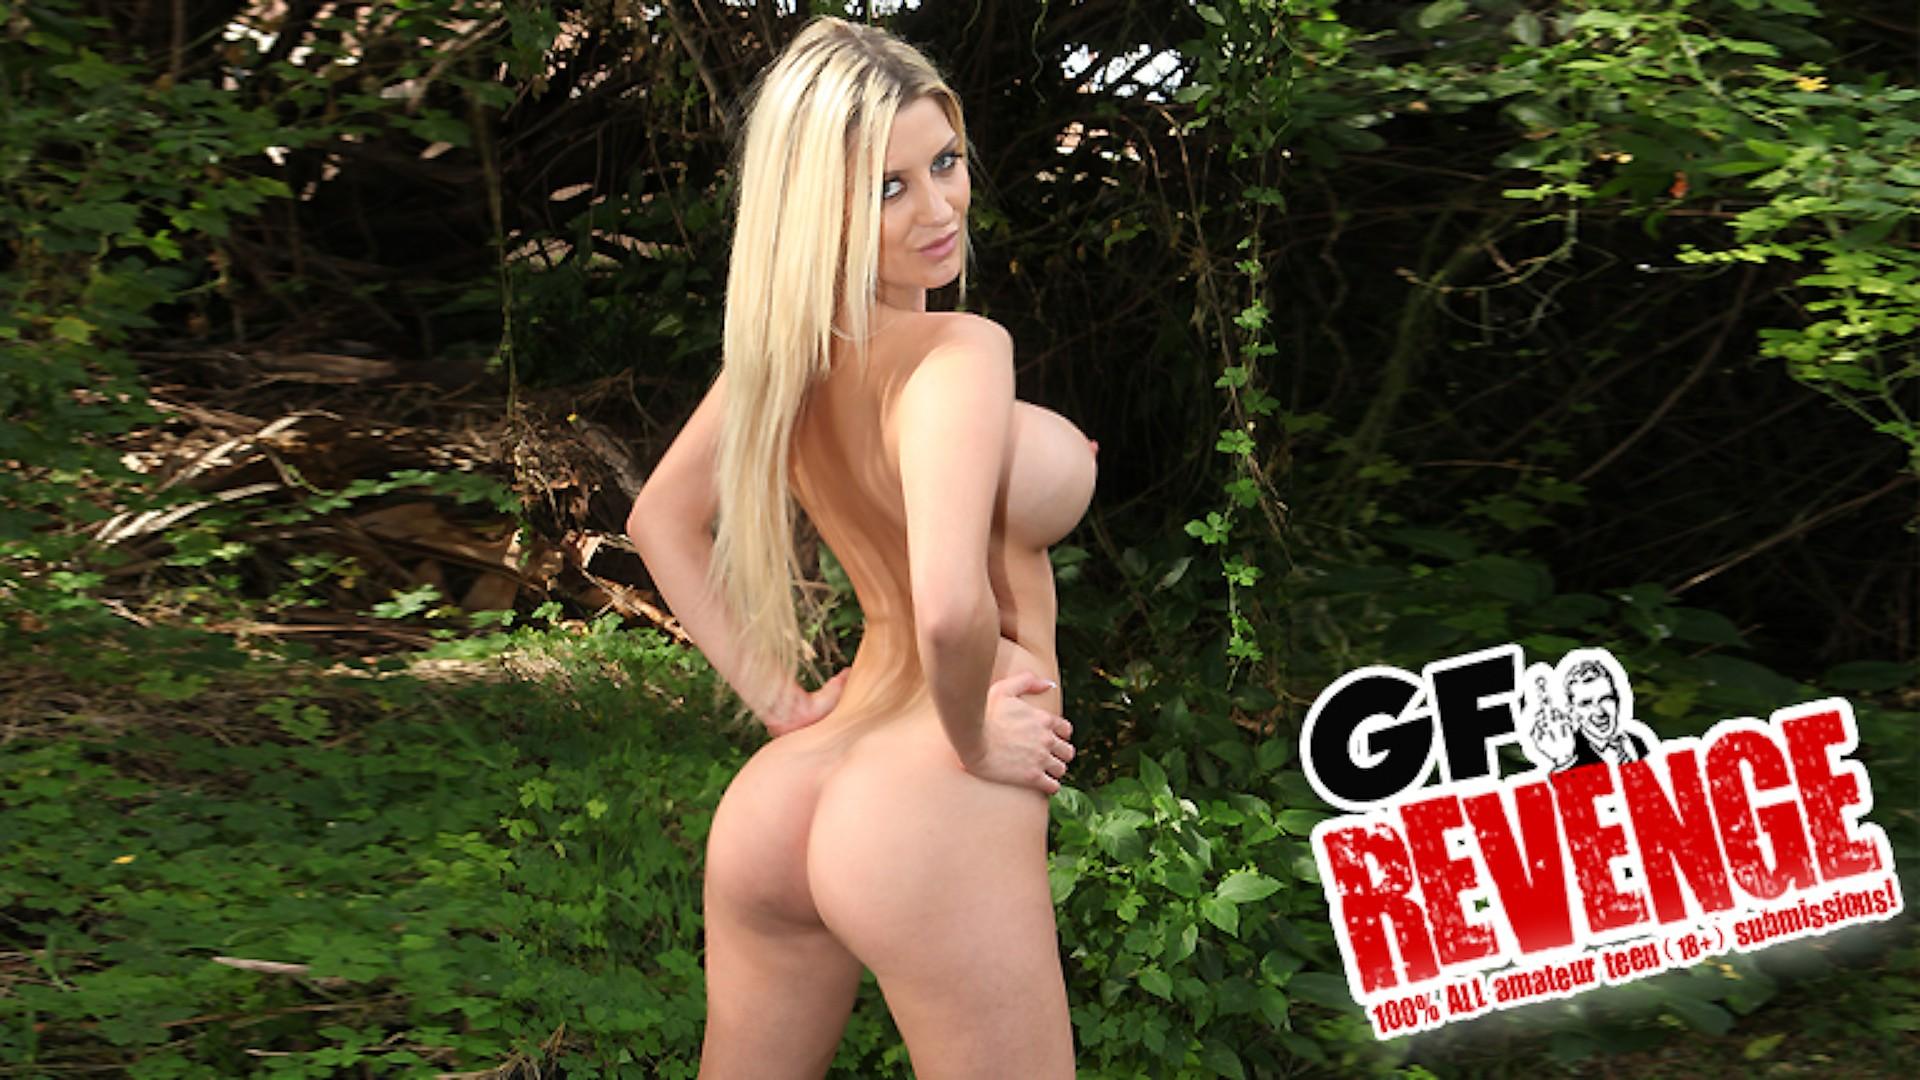 Nude Nature - GF Revenge